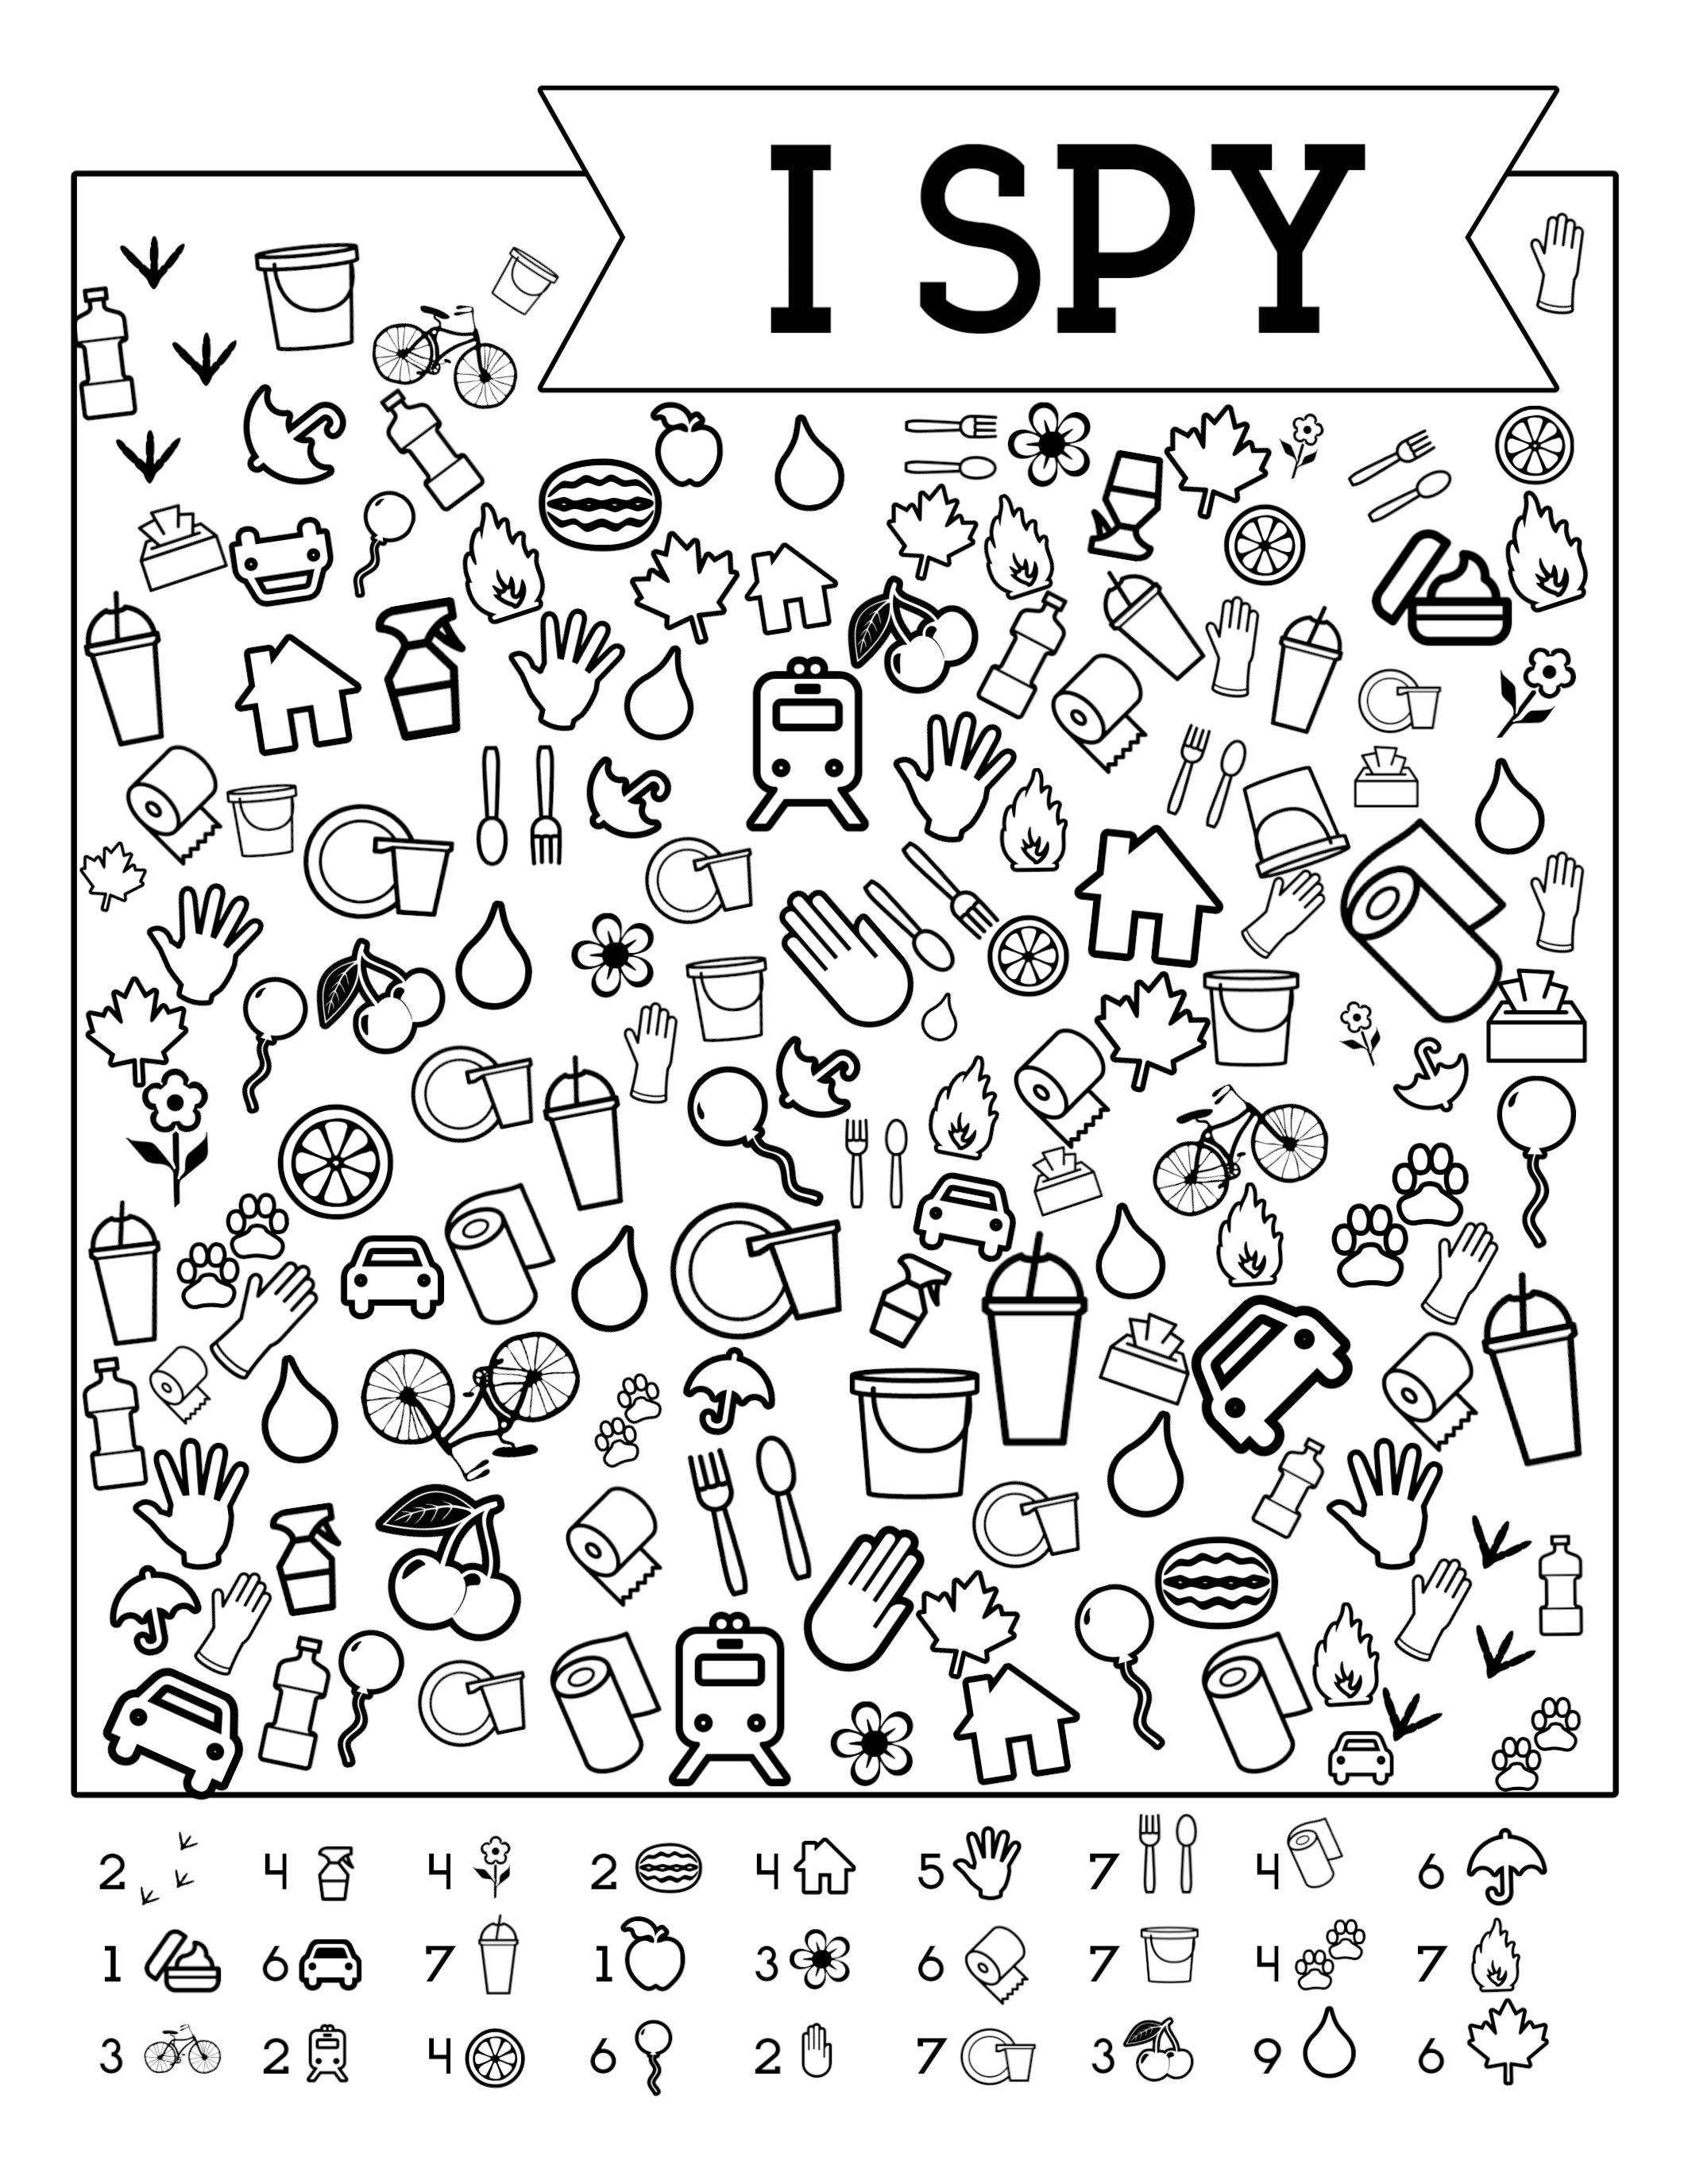 I-Spy-Free-Printable-Kids-Game   Spy School Camp   Spy Games For - Free Printable Activities For Kids